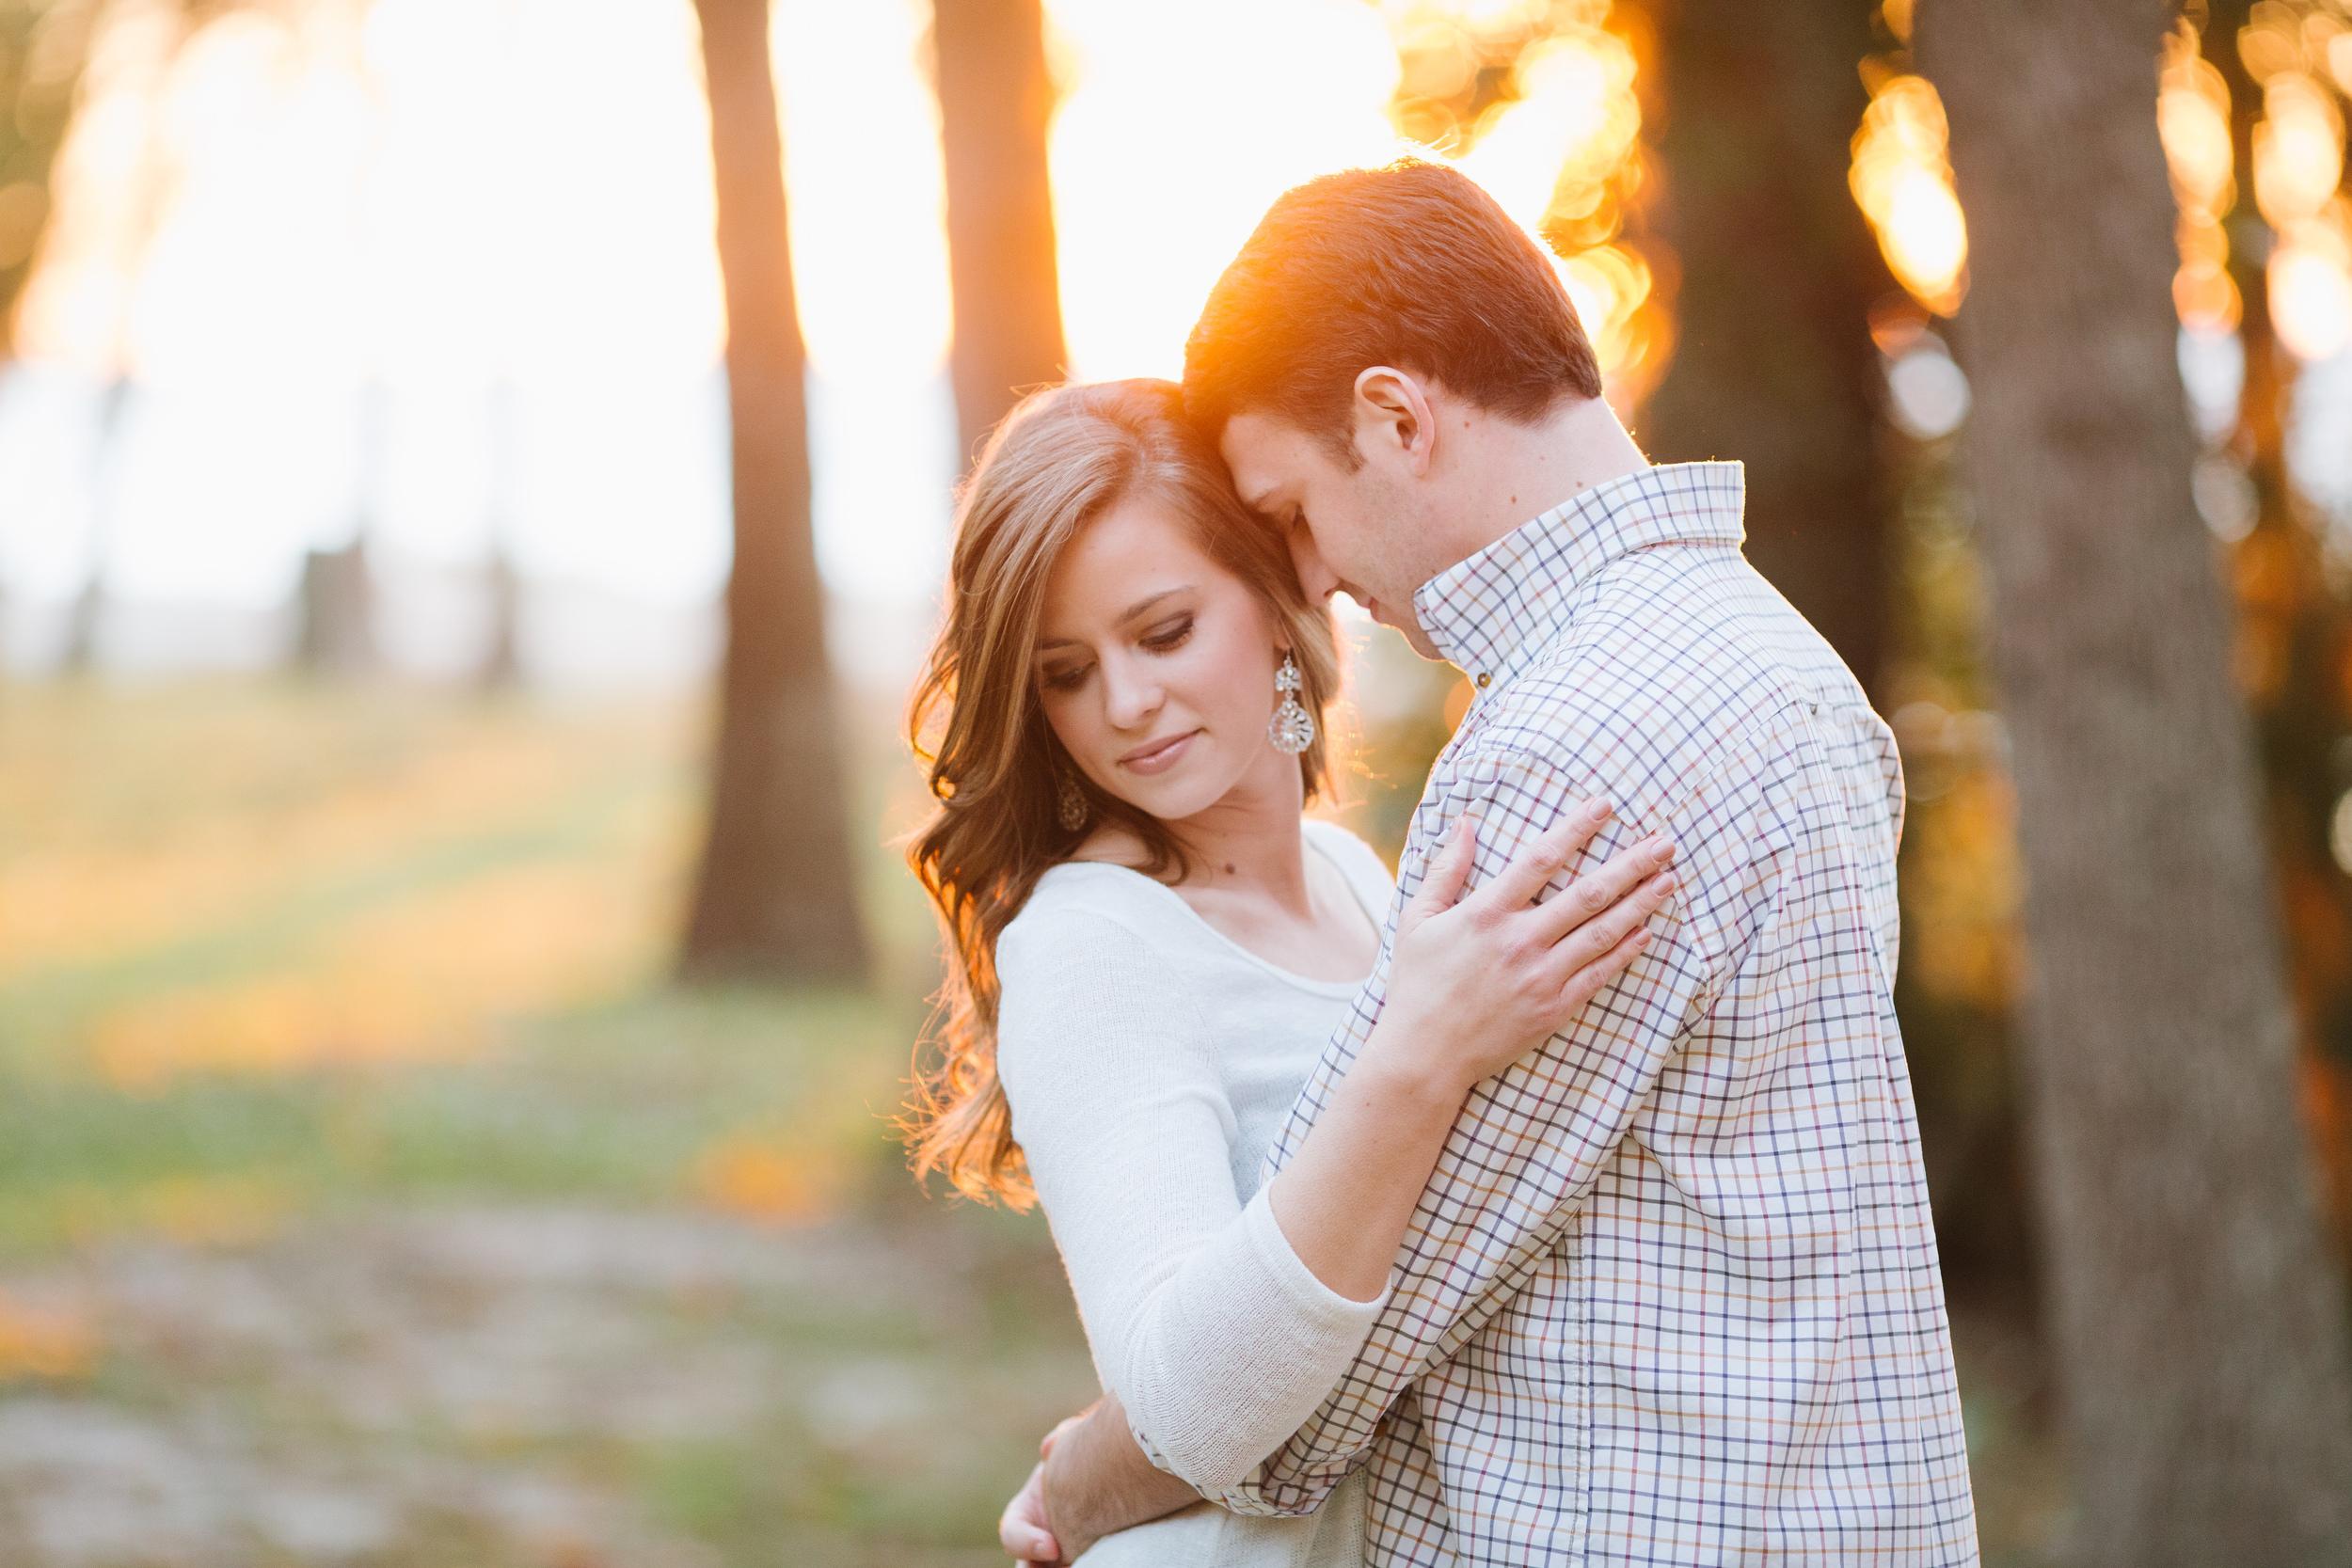 Dragonfly photography by Miranda | Engagement photographer Baldwin County, Fairhope, Mobile, Orange Beach, Daphne, Alabama Weddings